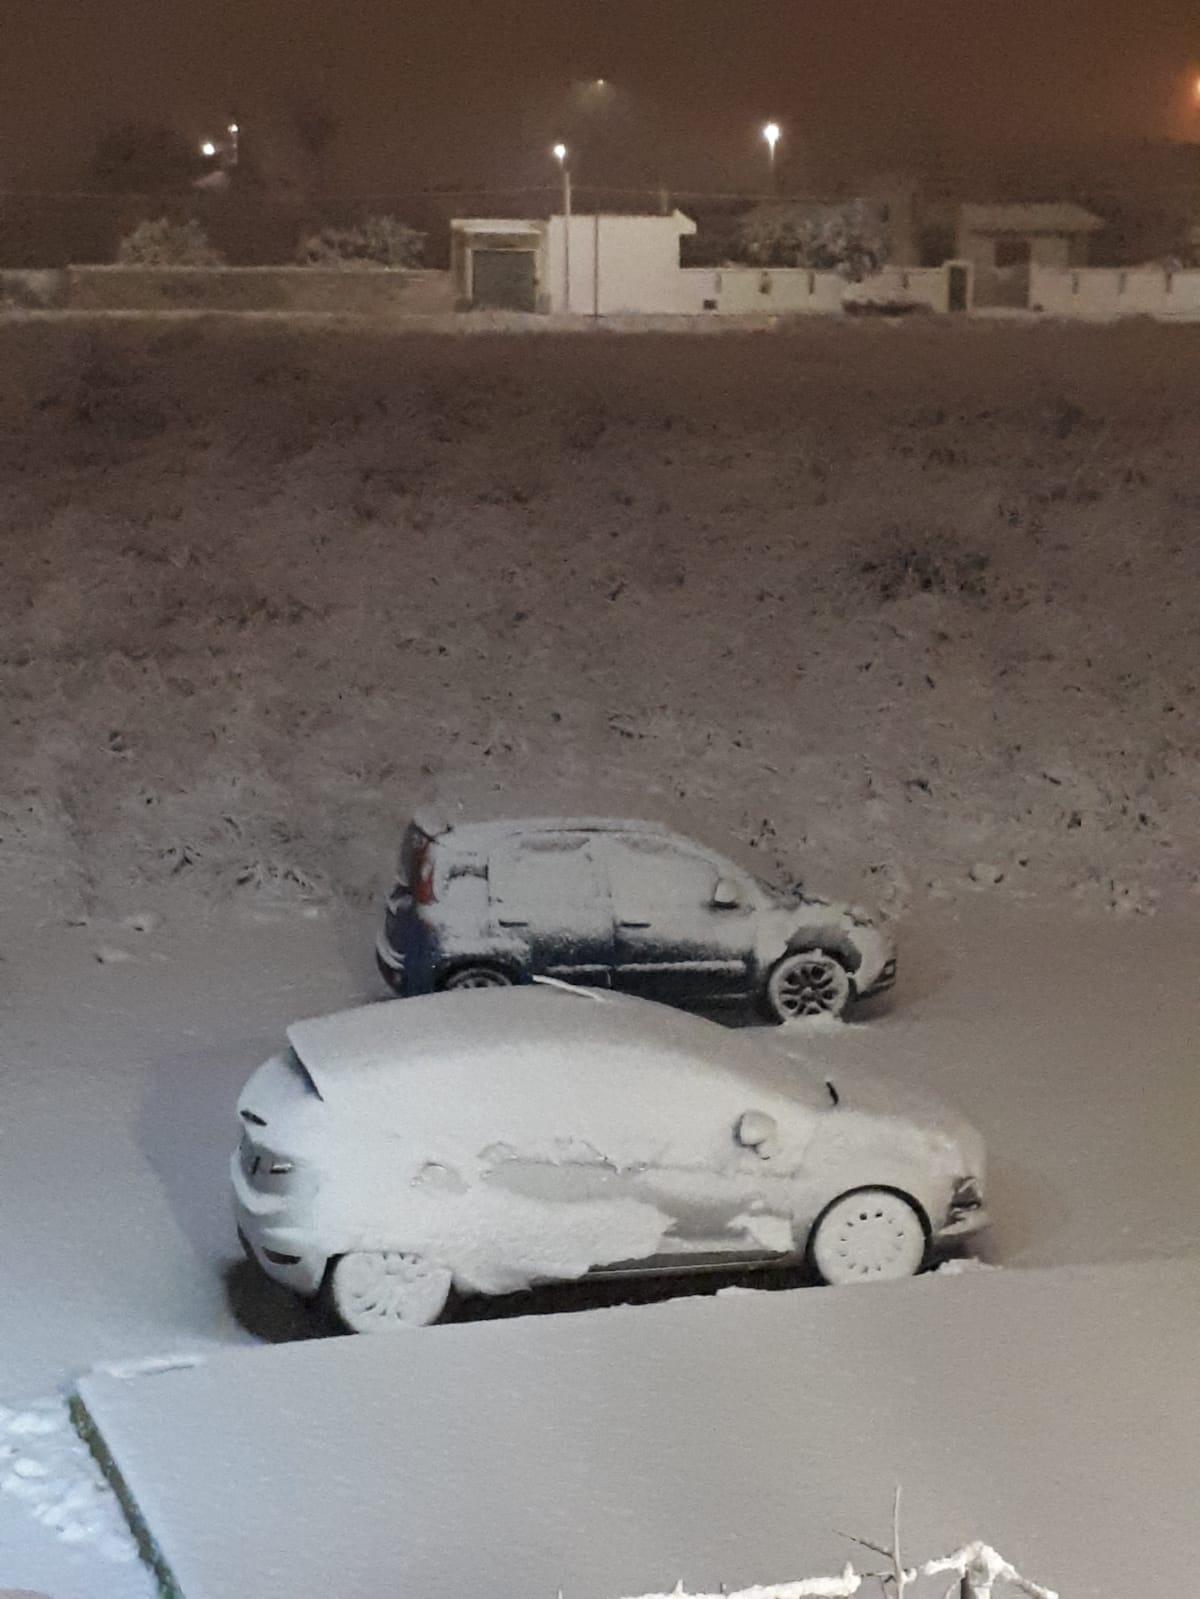 Snowcasting BR - LE - TA 4 Gennaio 2019-whatsapp-image-2019-01-04-at-06.08.56.jpeg